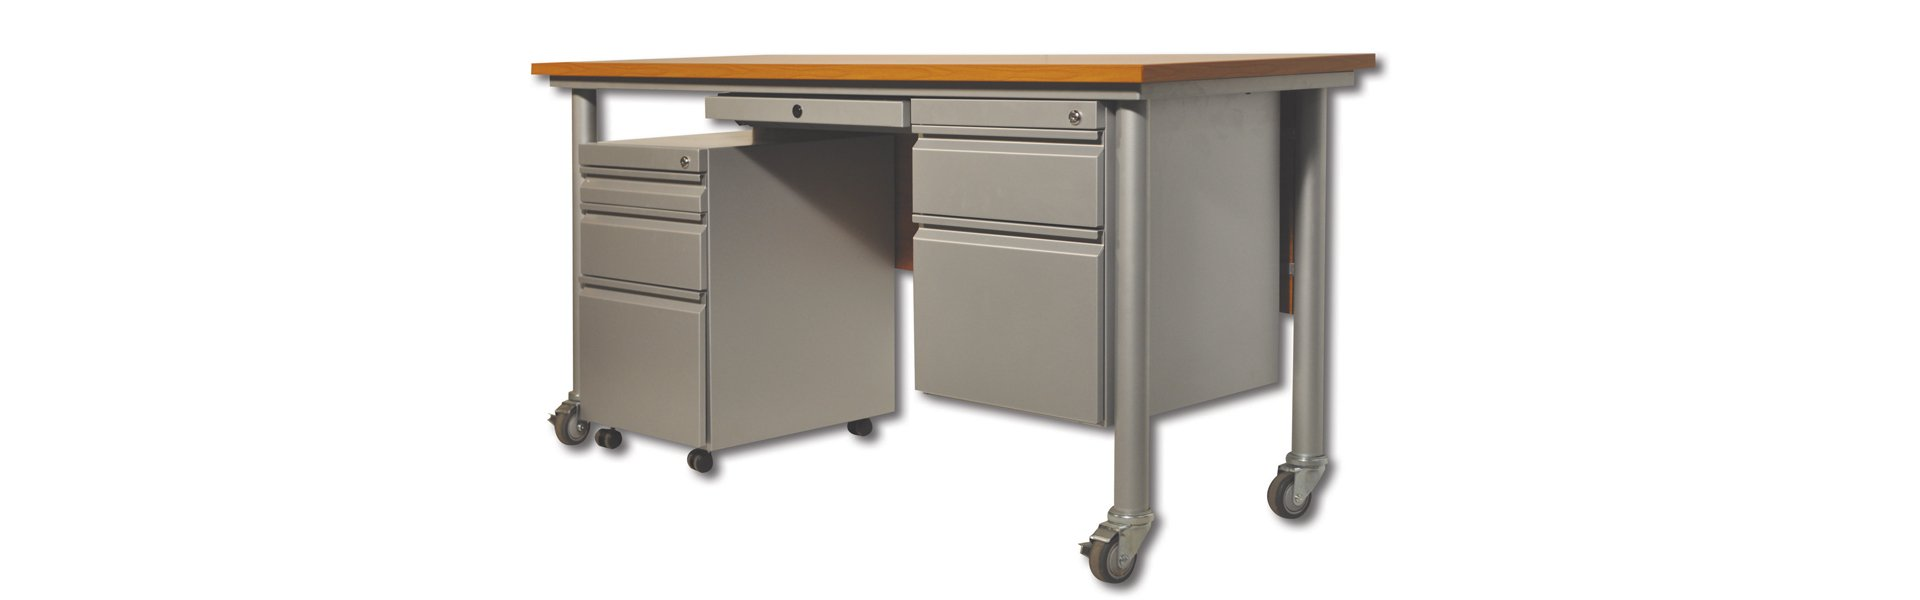 Corilam Teachers Desk